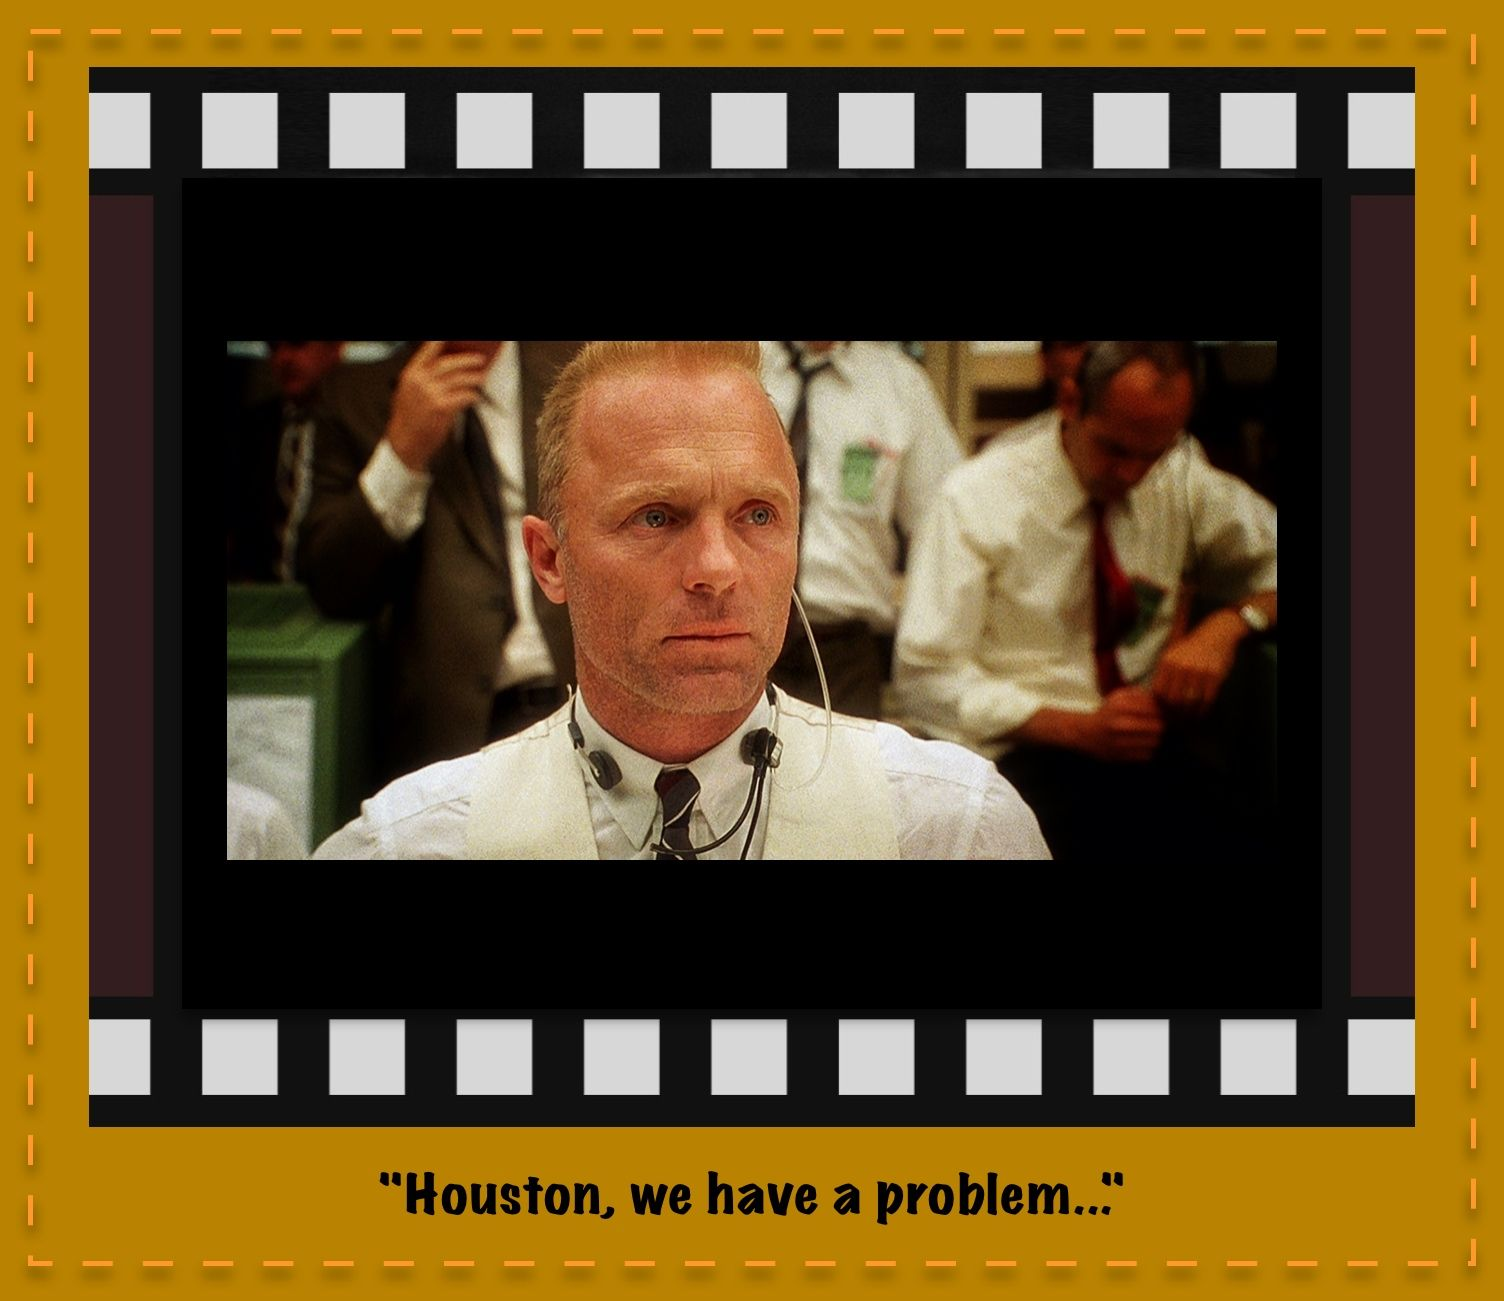 Apollo 13 Quotes Delightful apollo 13 | epic movie quotes | pinterest | apollo 13 and epic movie